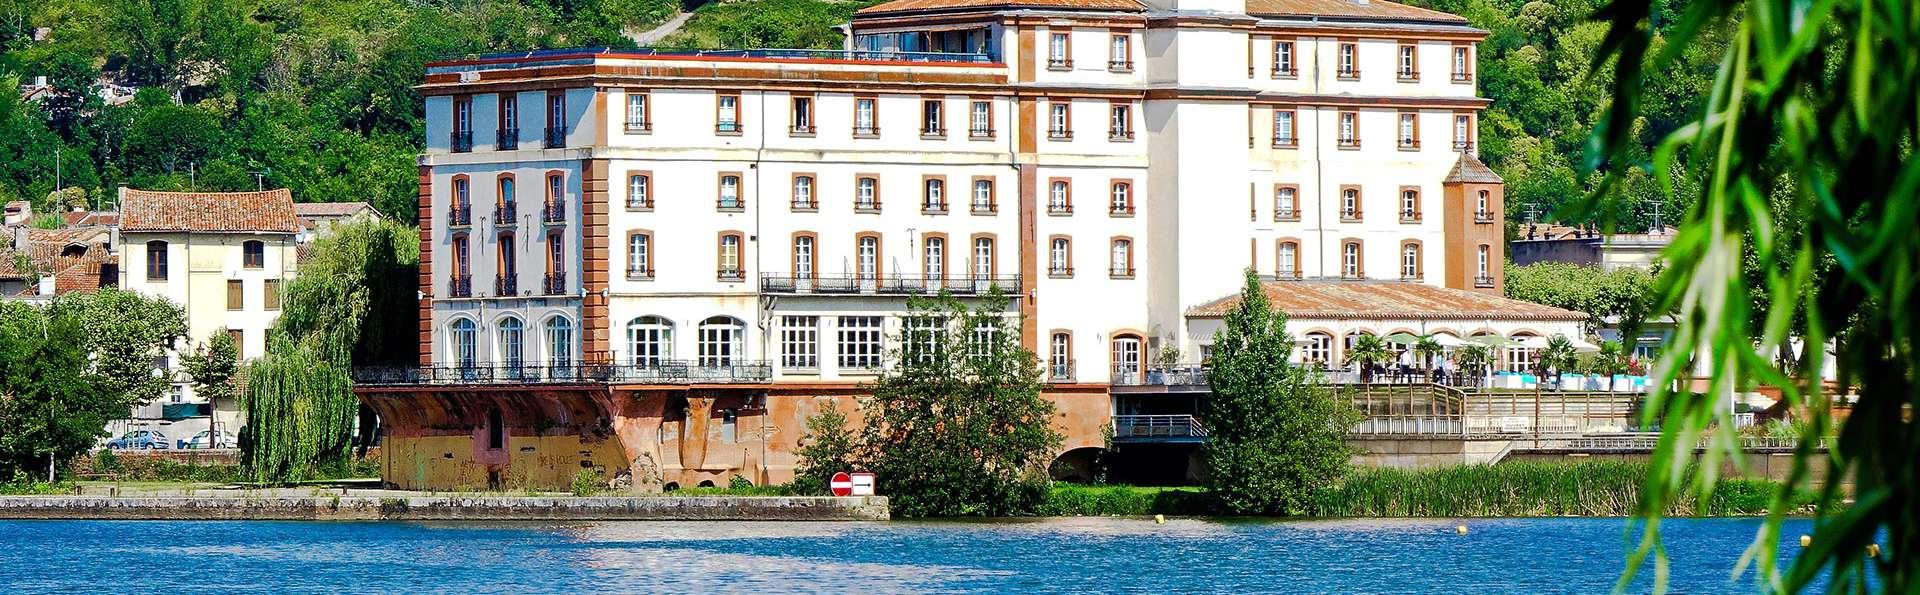 Hôtel & Spa - Moulin de Moissac  - edit_front2.jpg